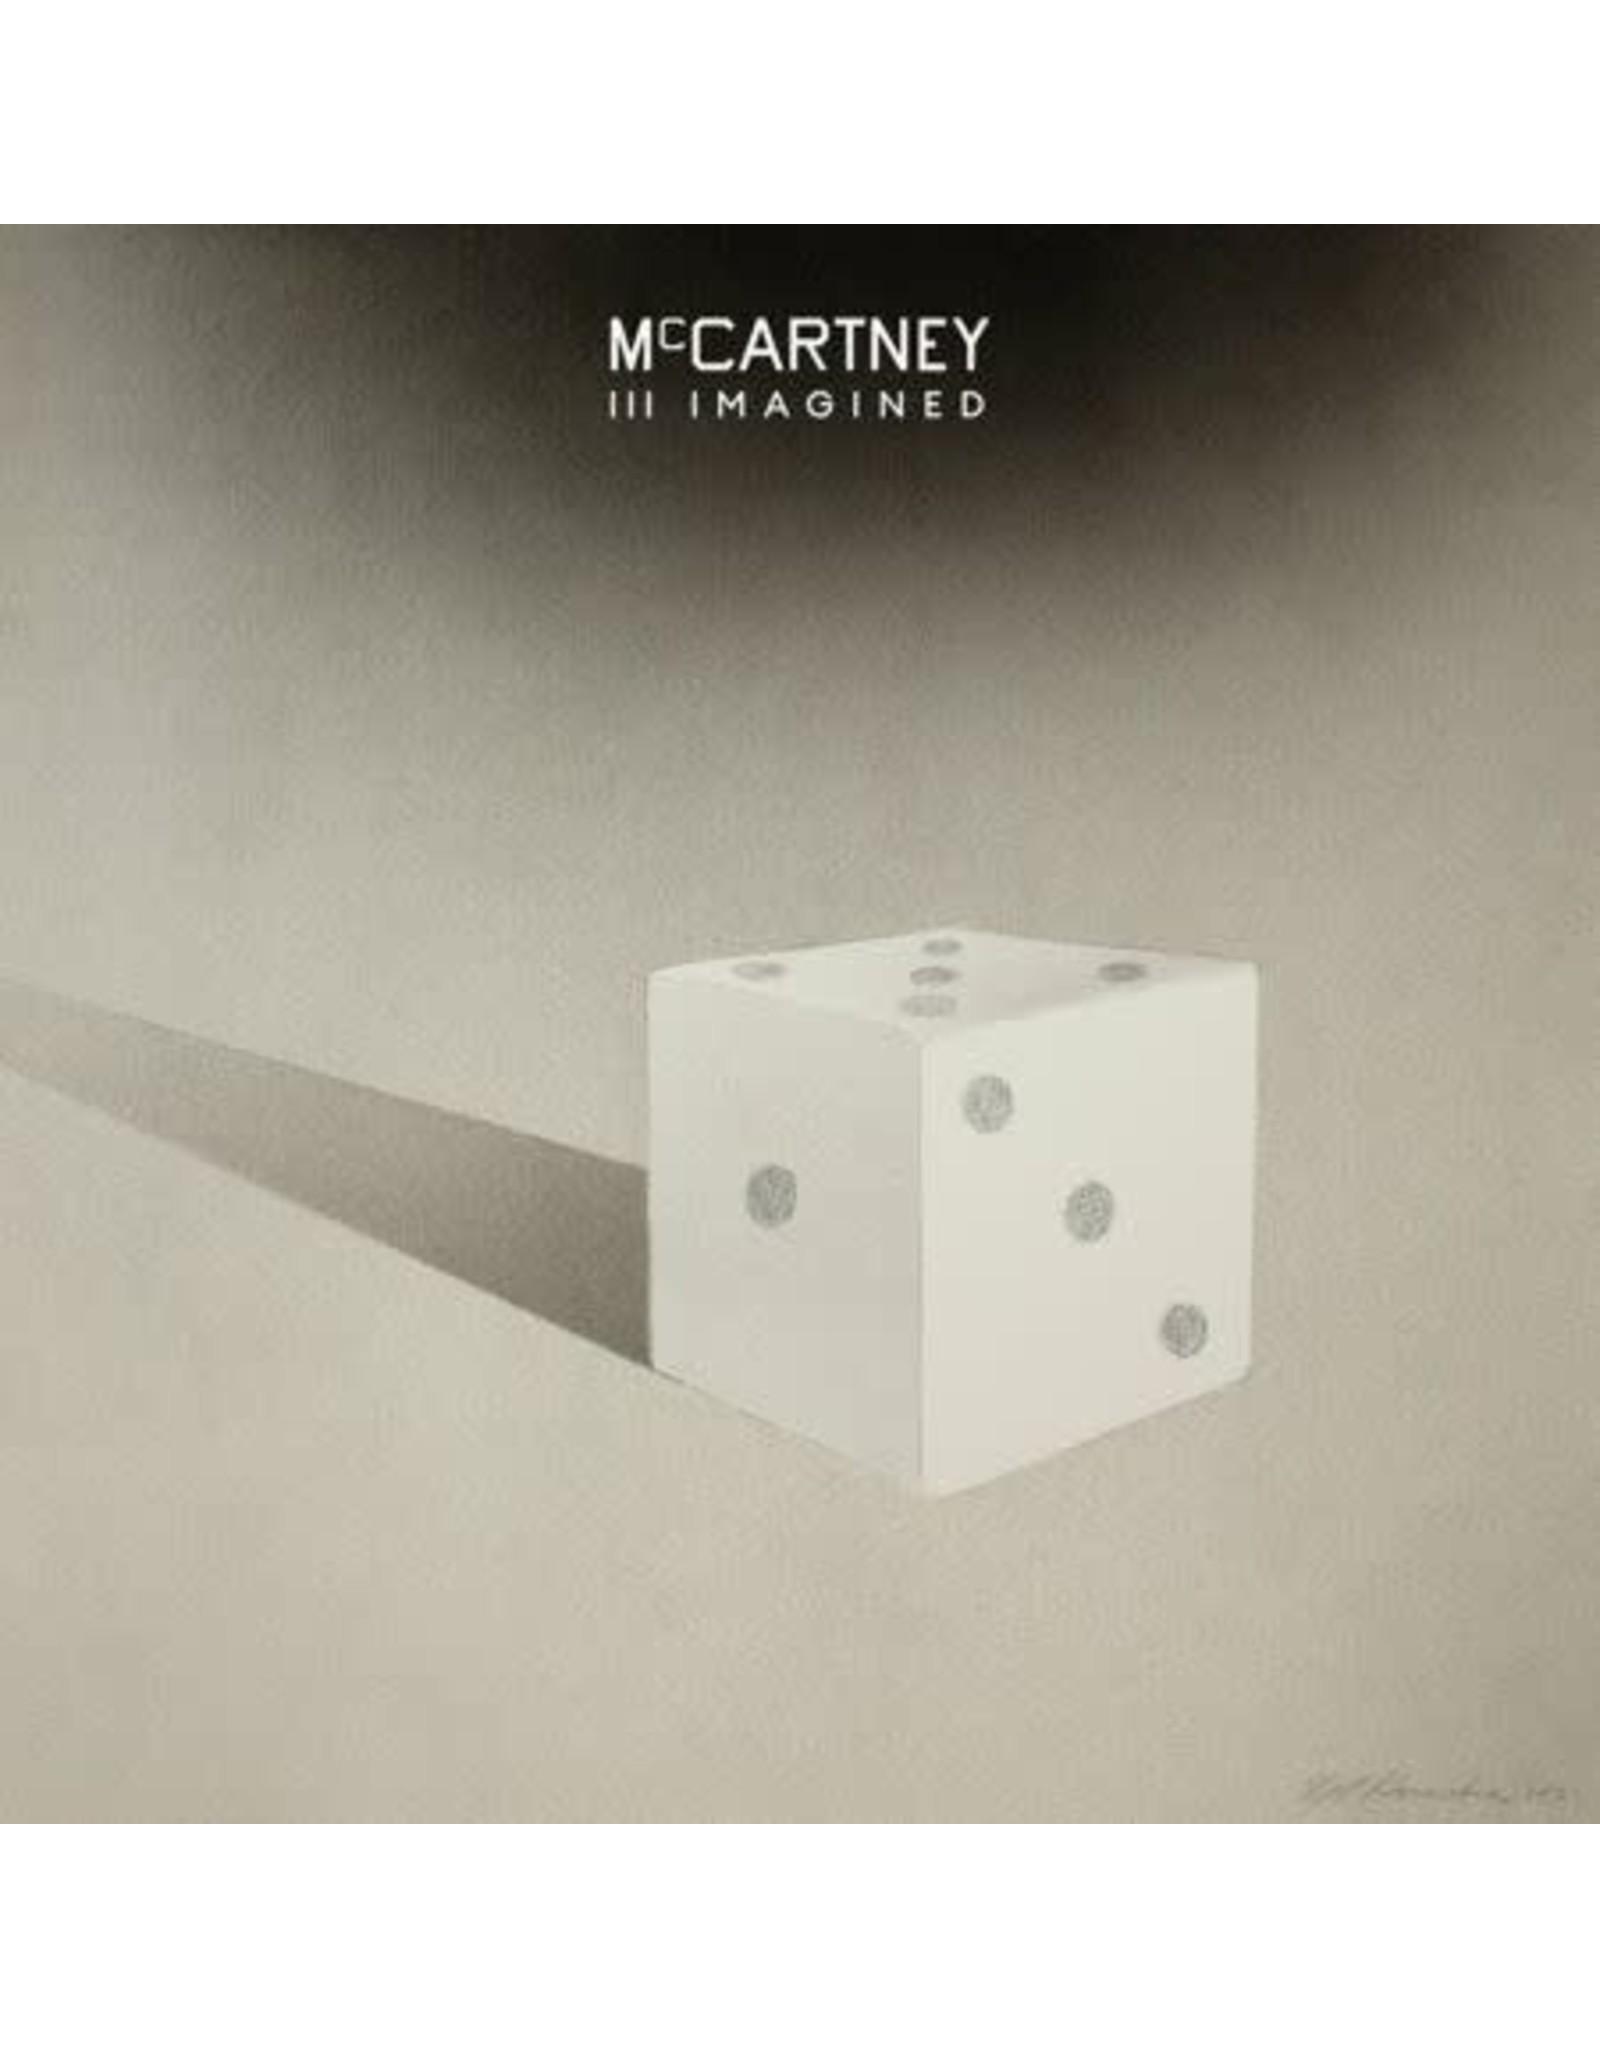 McCartney, Paul - McCartney III Imagined 2LP